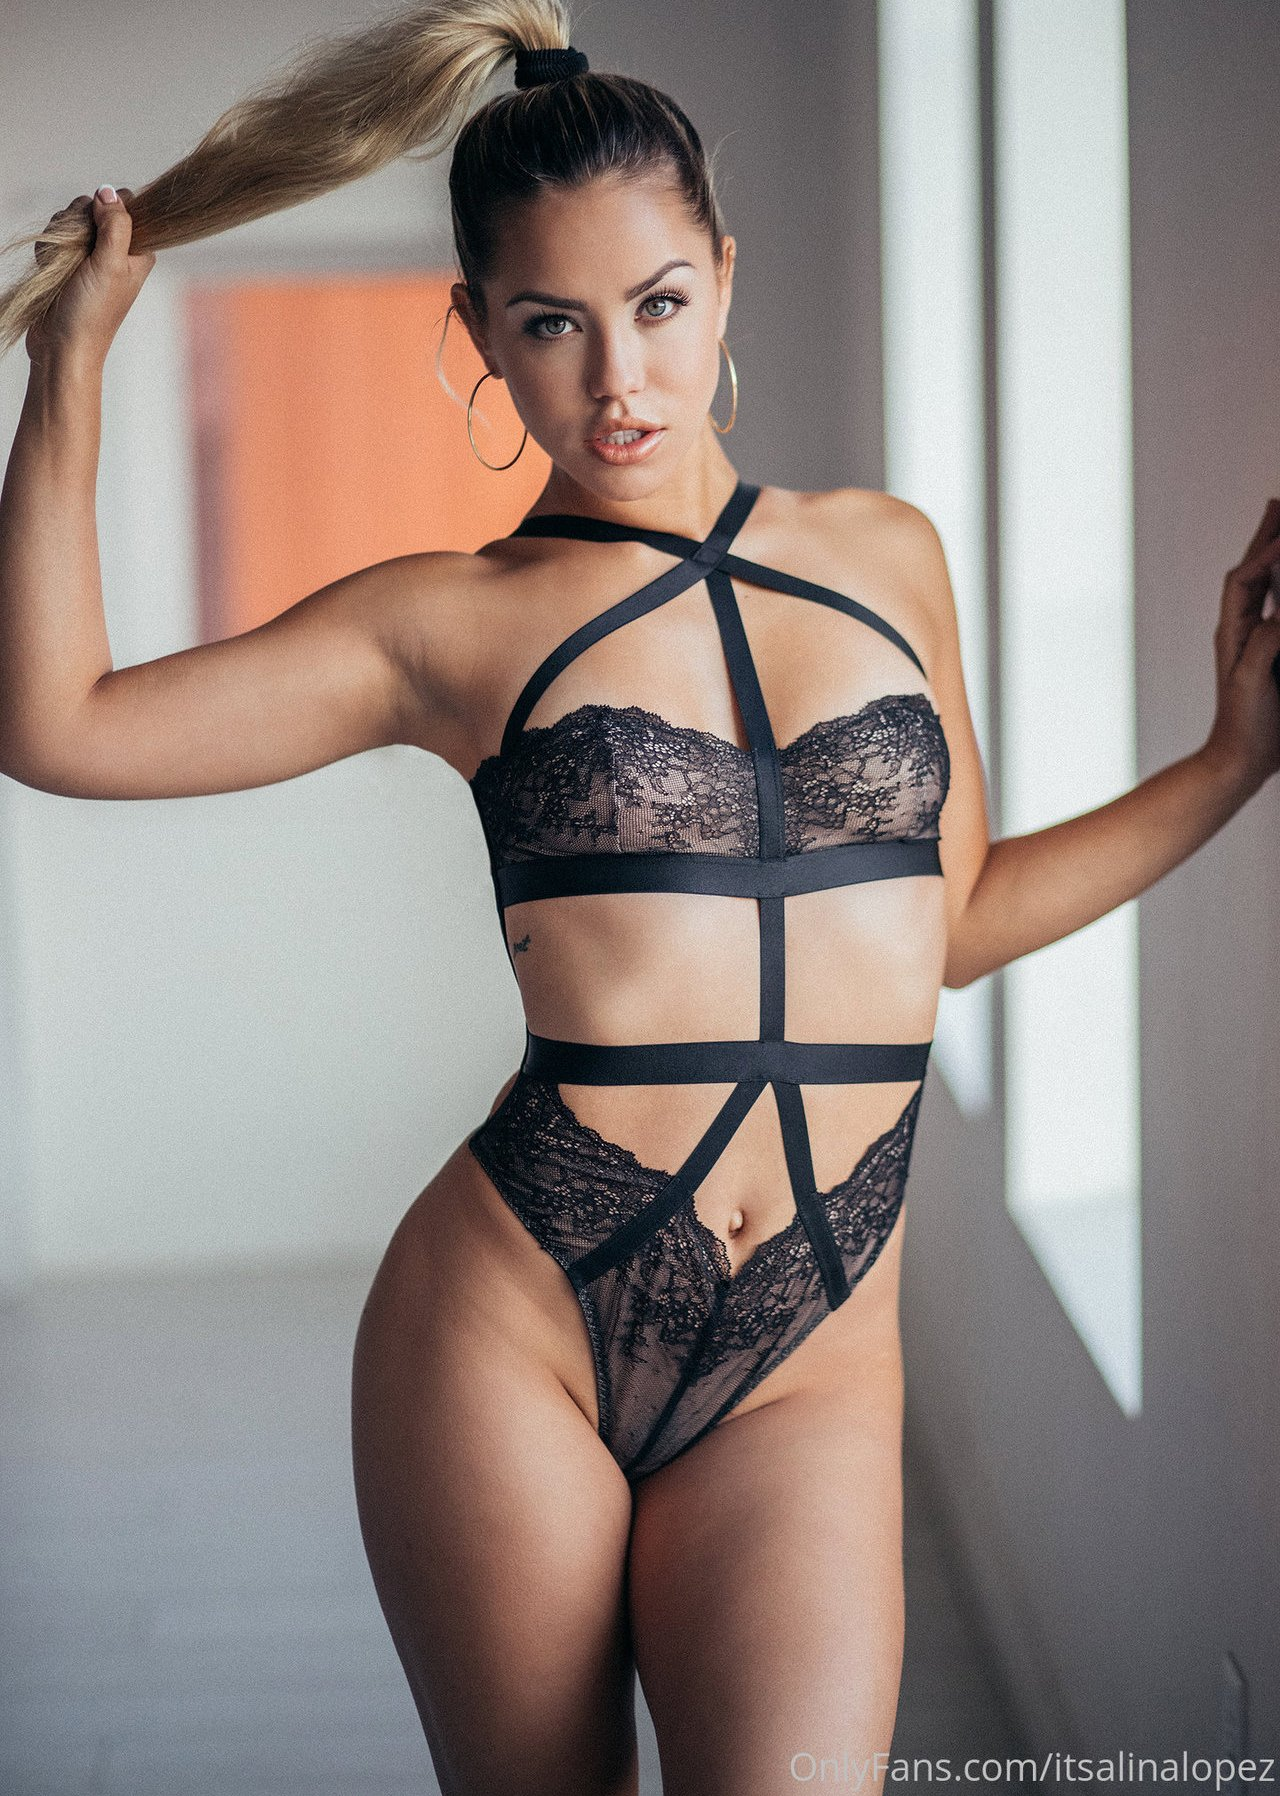 Alina Lopez Itsalinalopez Onlyfans Nude Leaks 0032